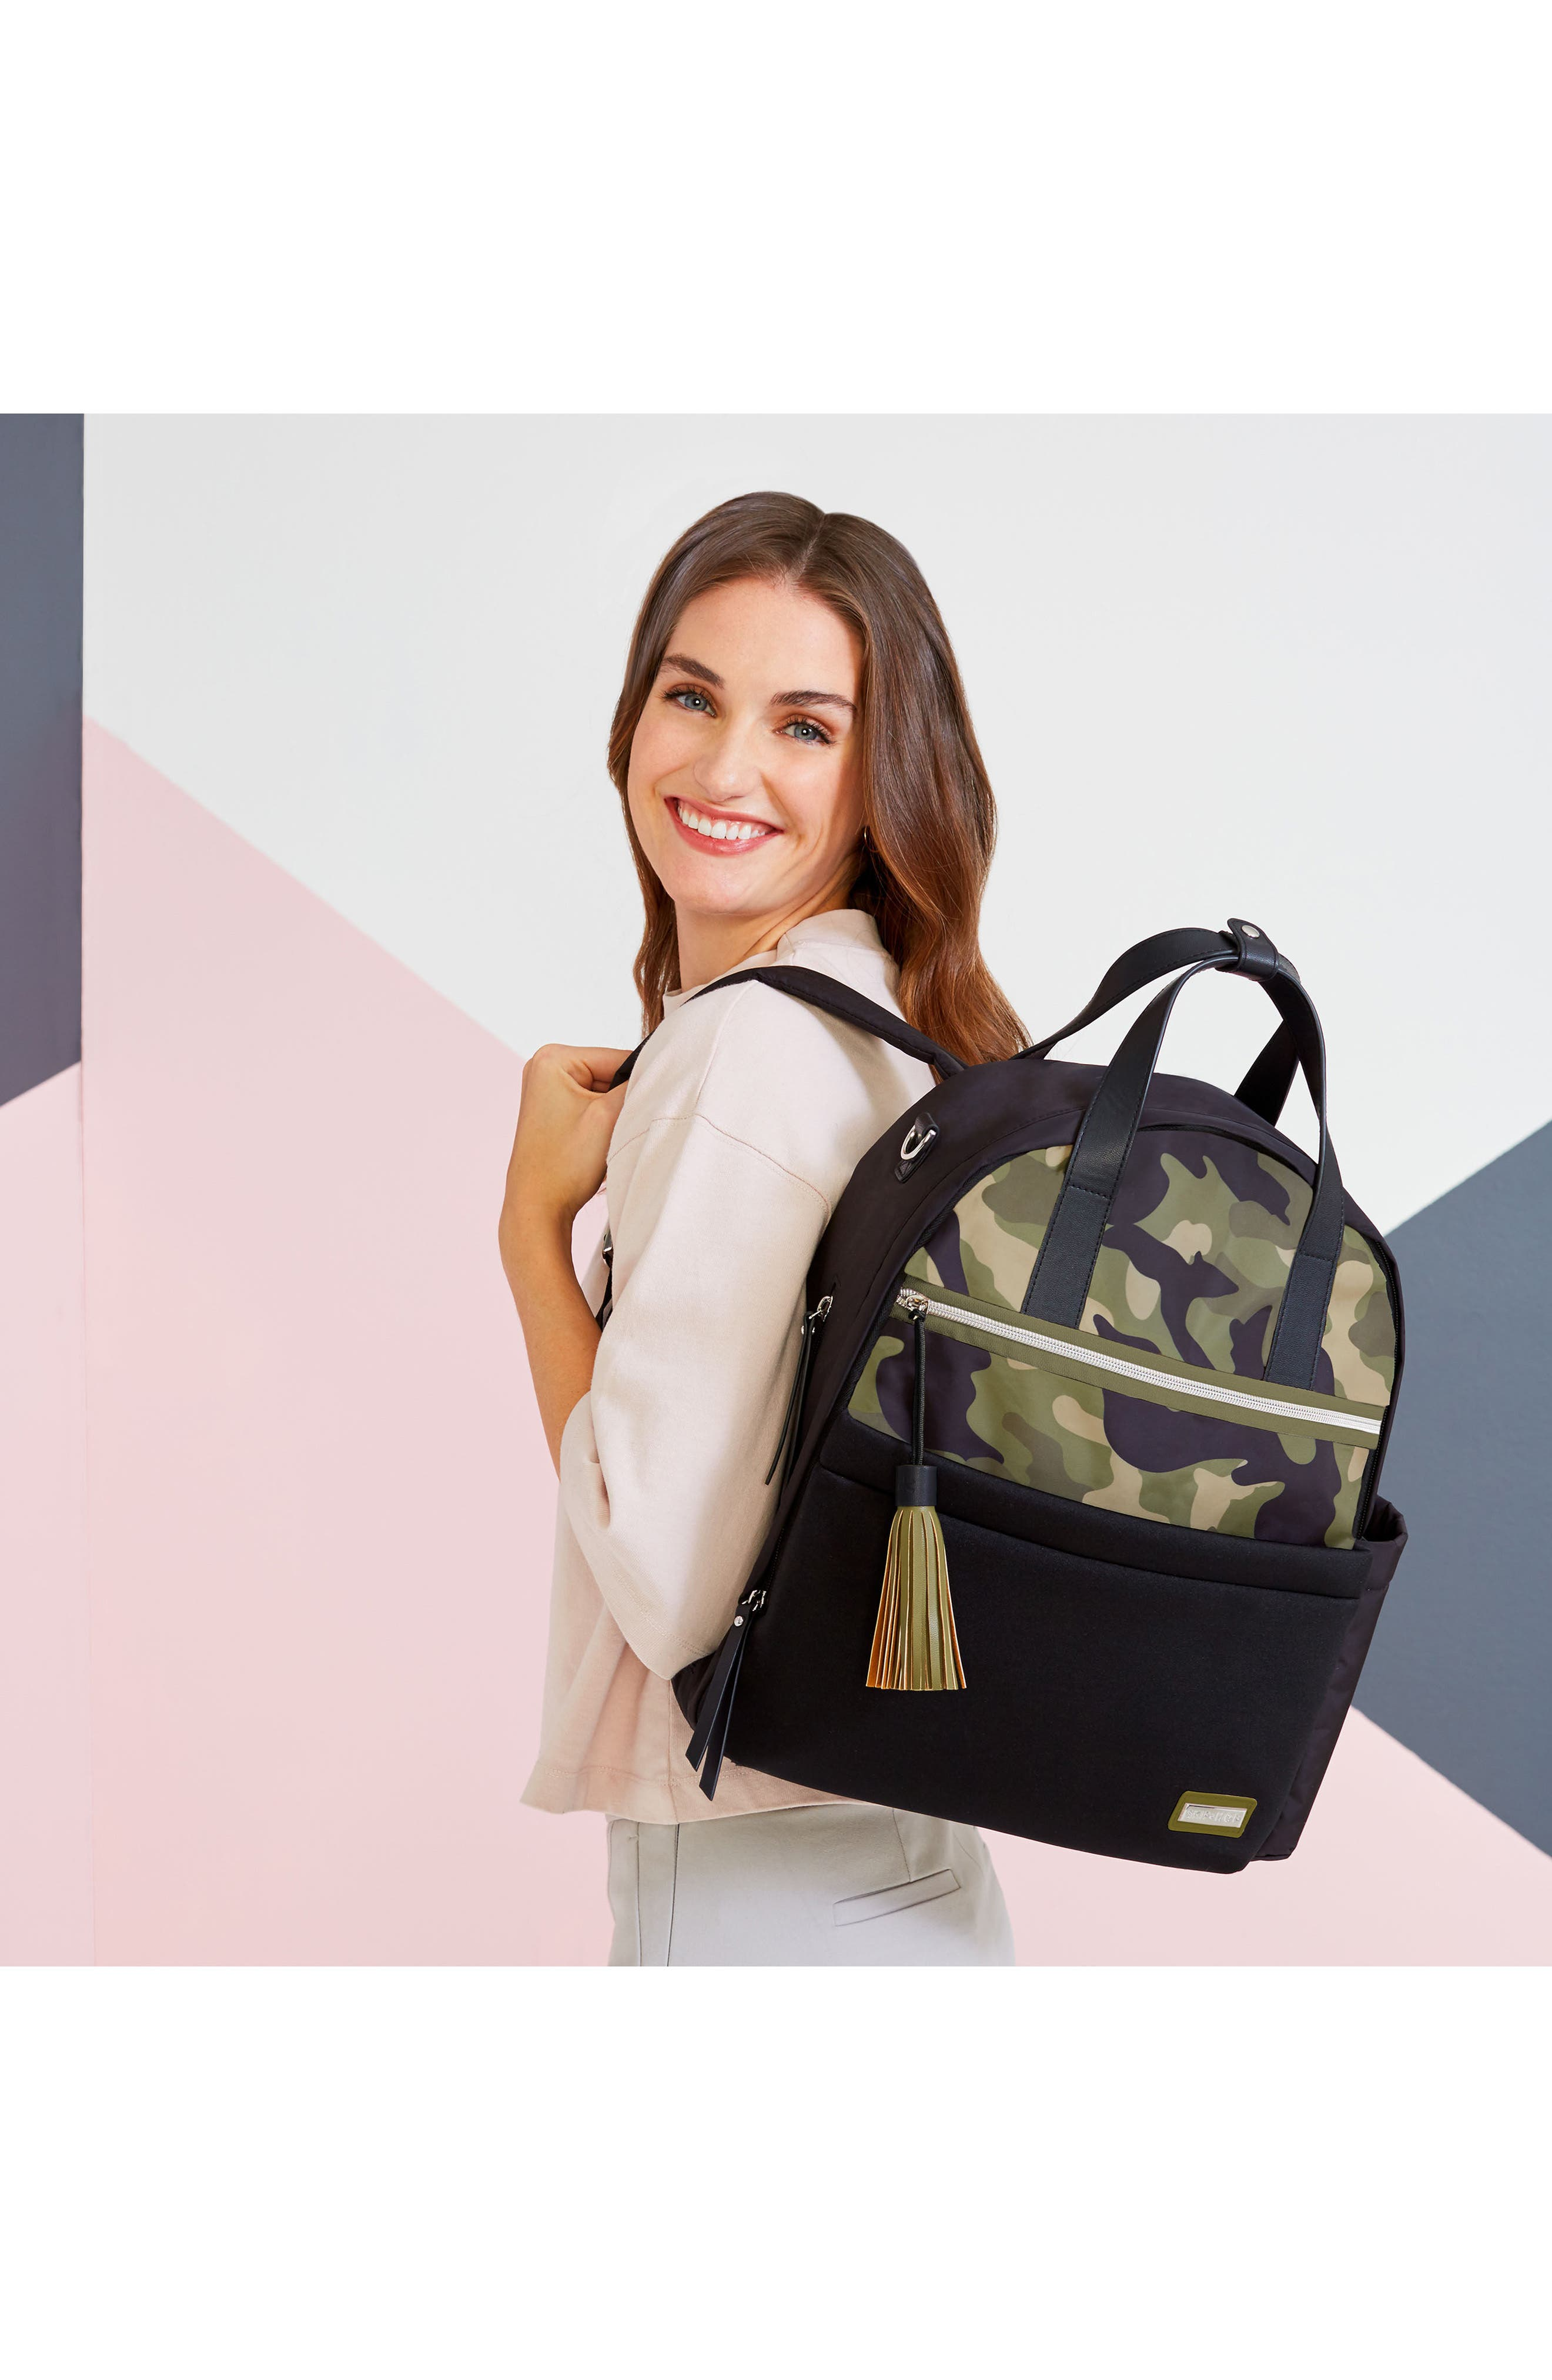 Nolita Neoprene Diaper Backpack,                             Alternate thumbnail 6, color,                             BLACK/ DARK CAMO